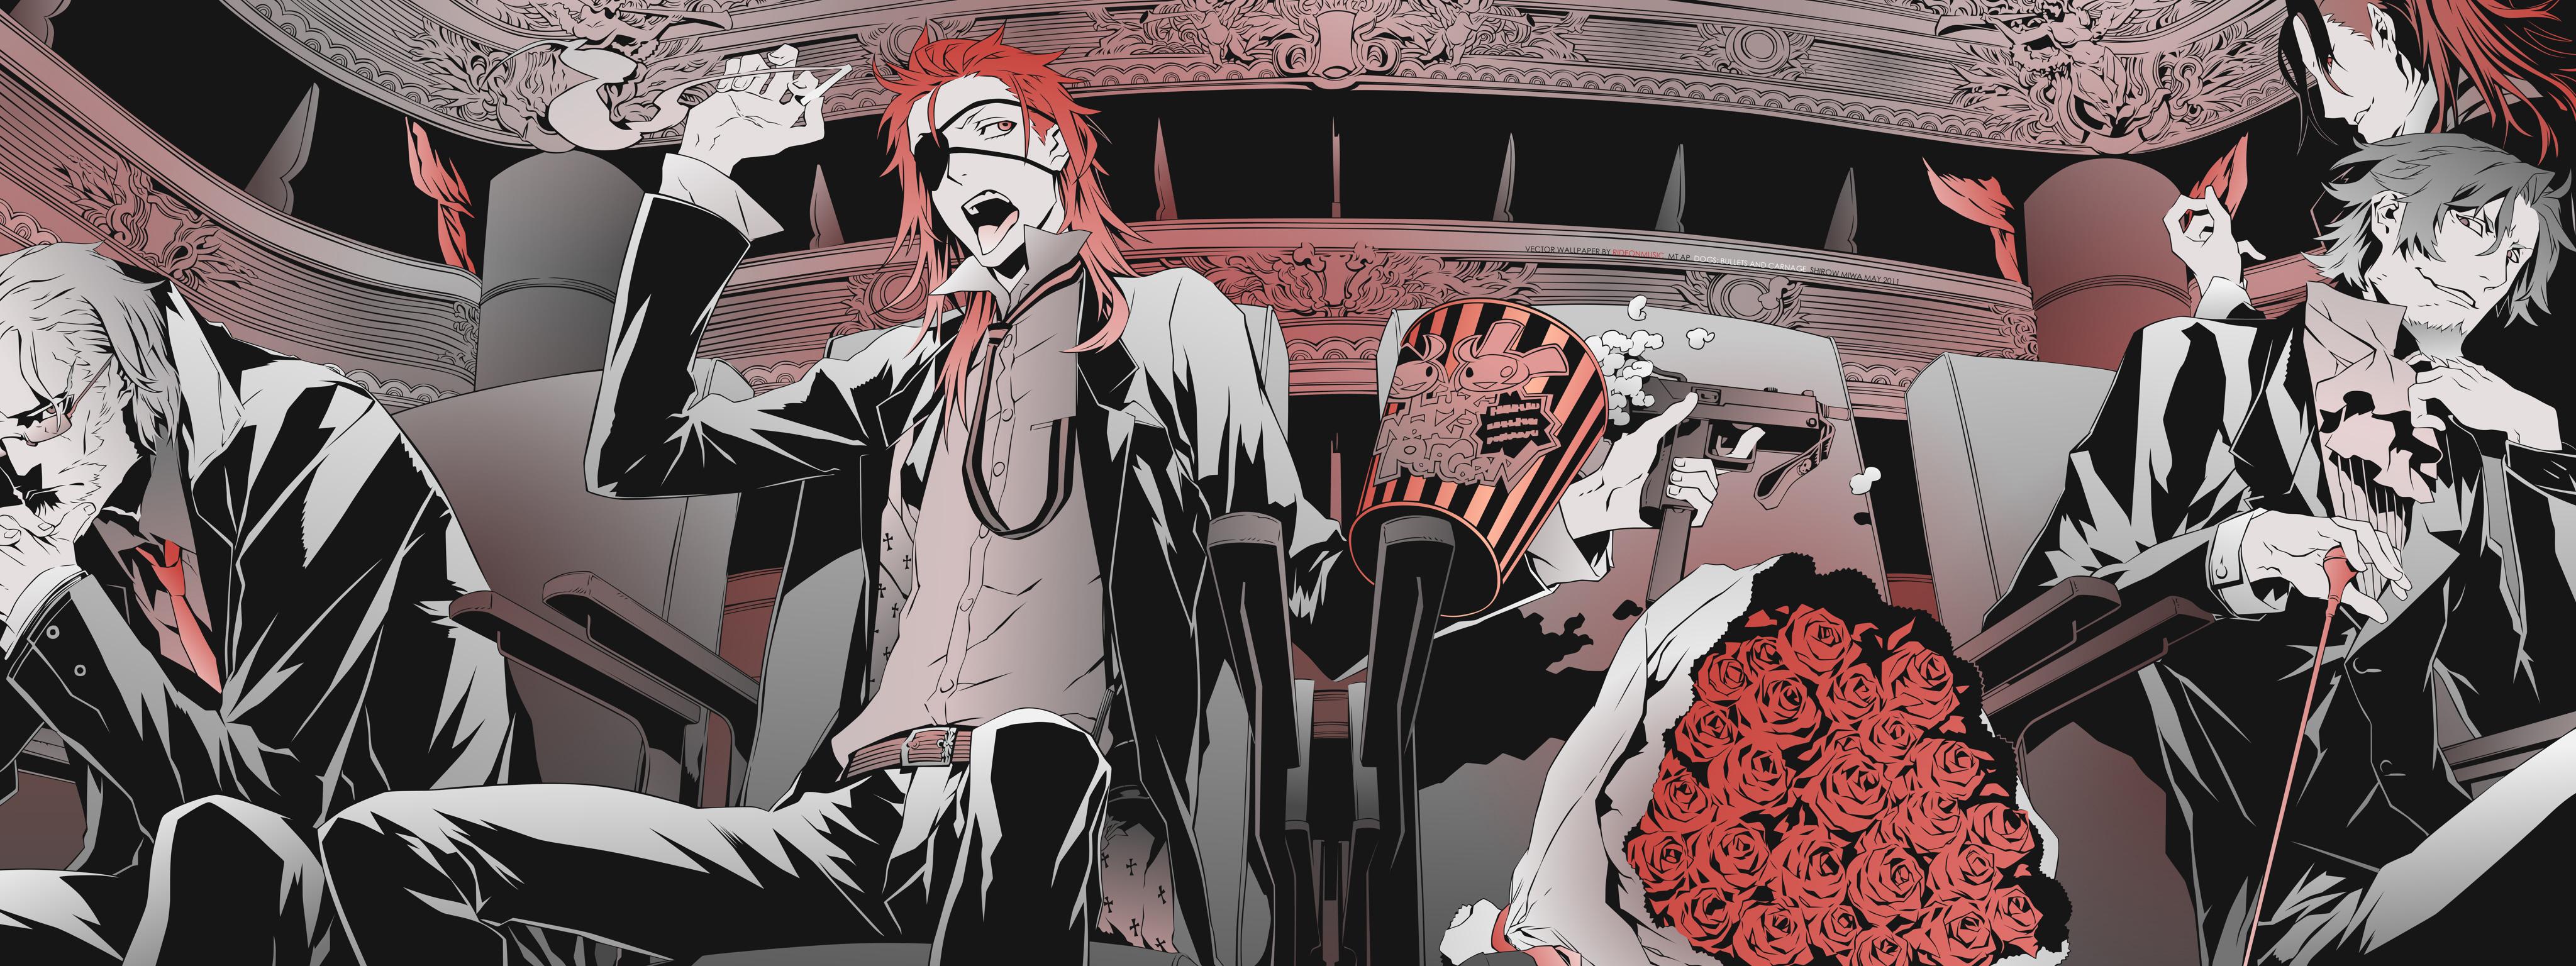 Anime 4096x1536 Bungou Stray Dogs theater rose popcorn eyepatches uzi